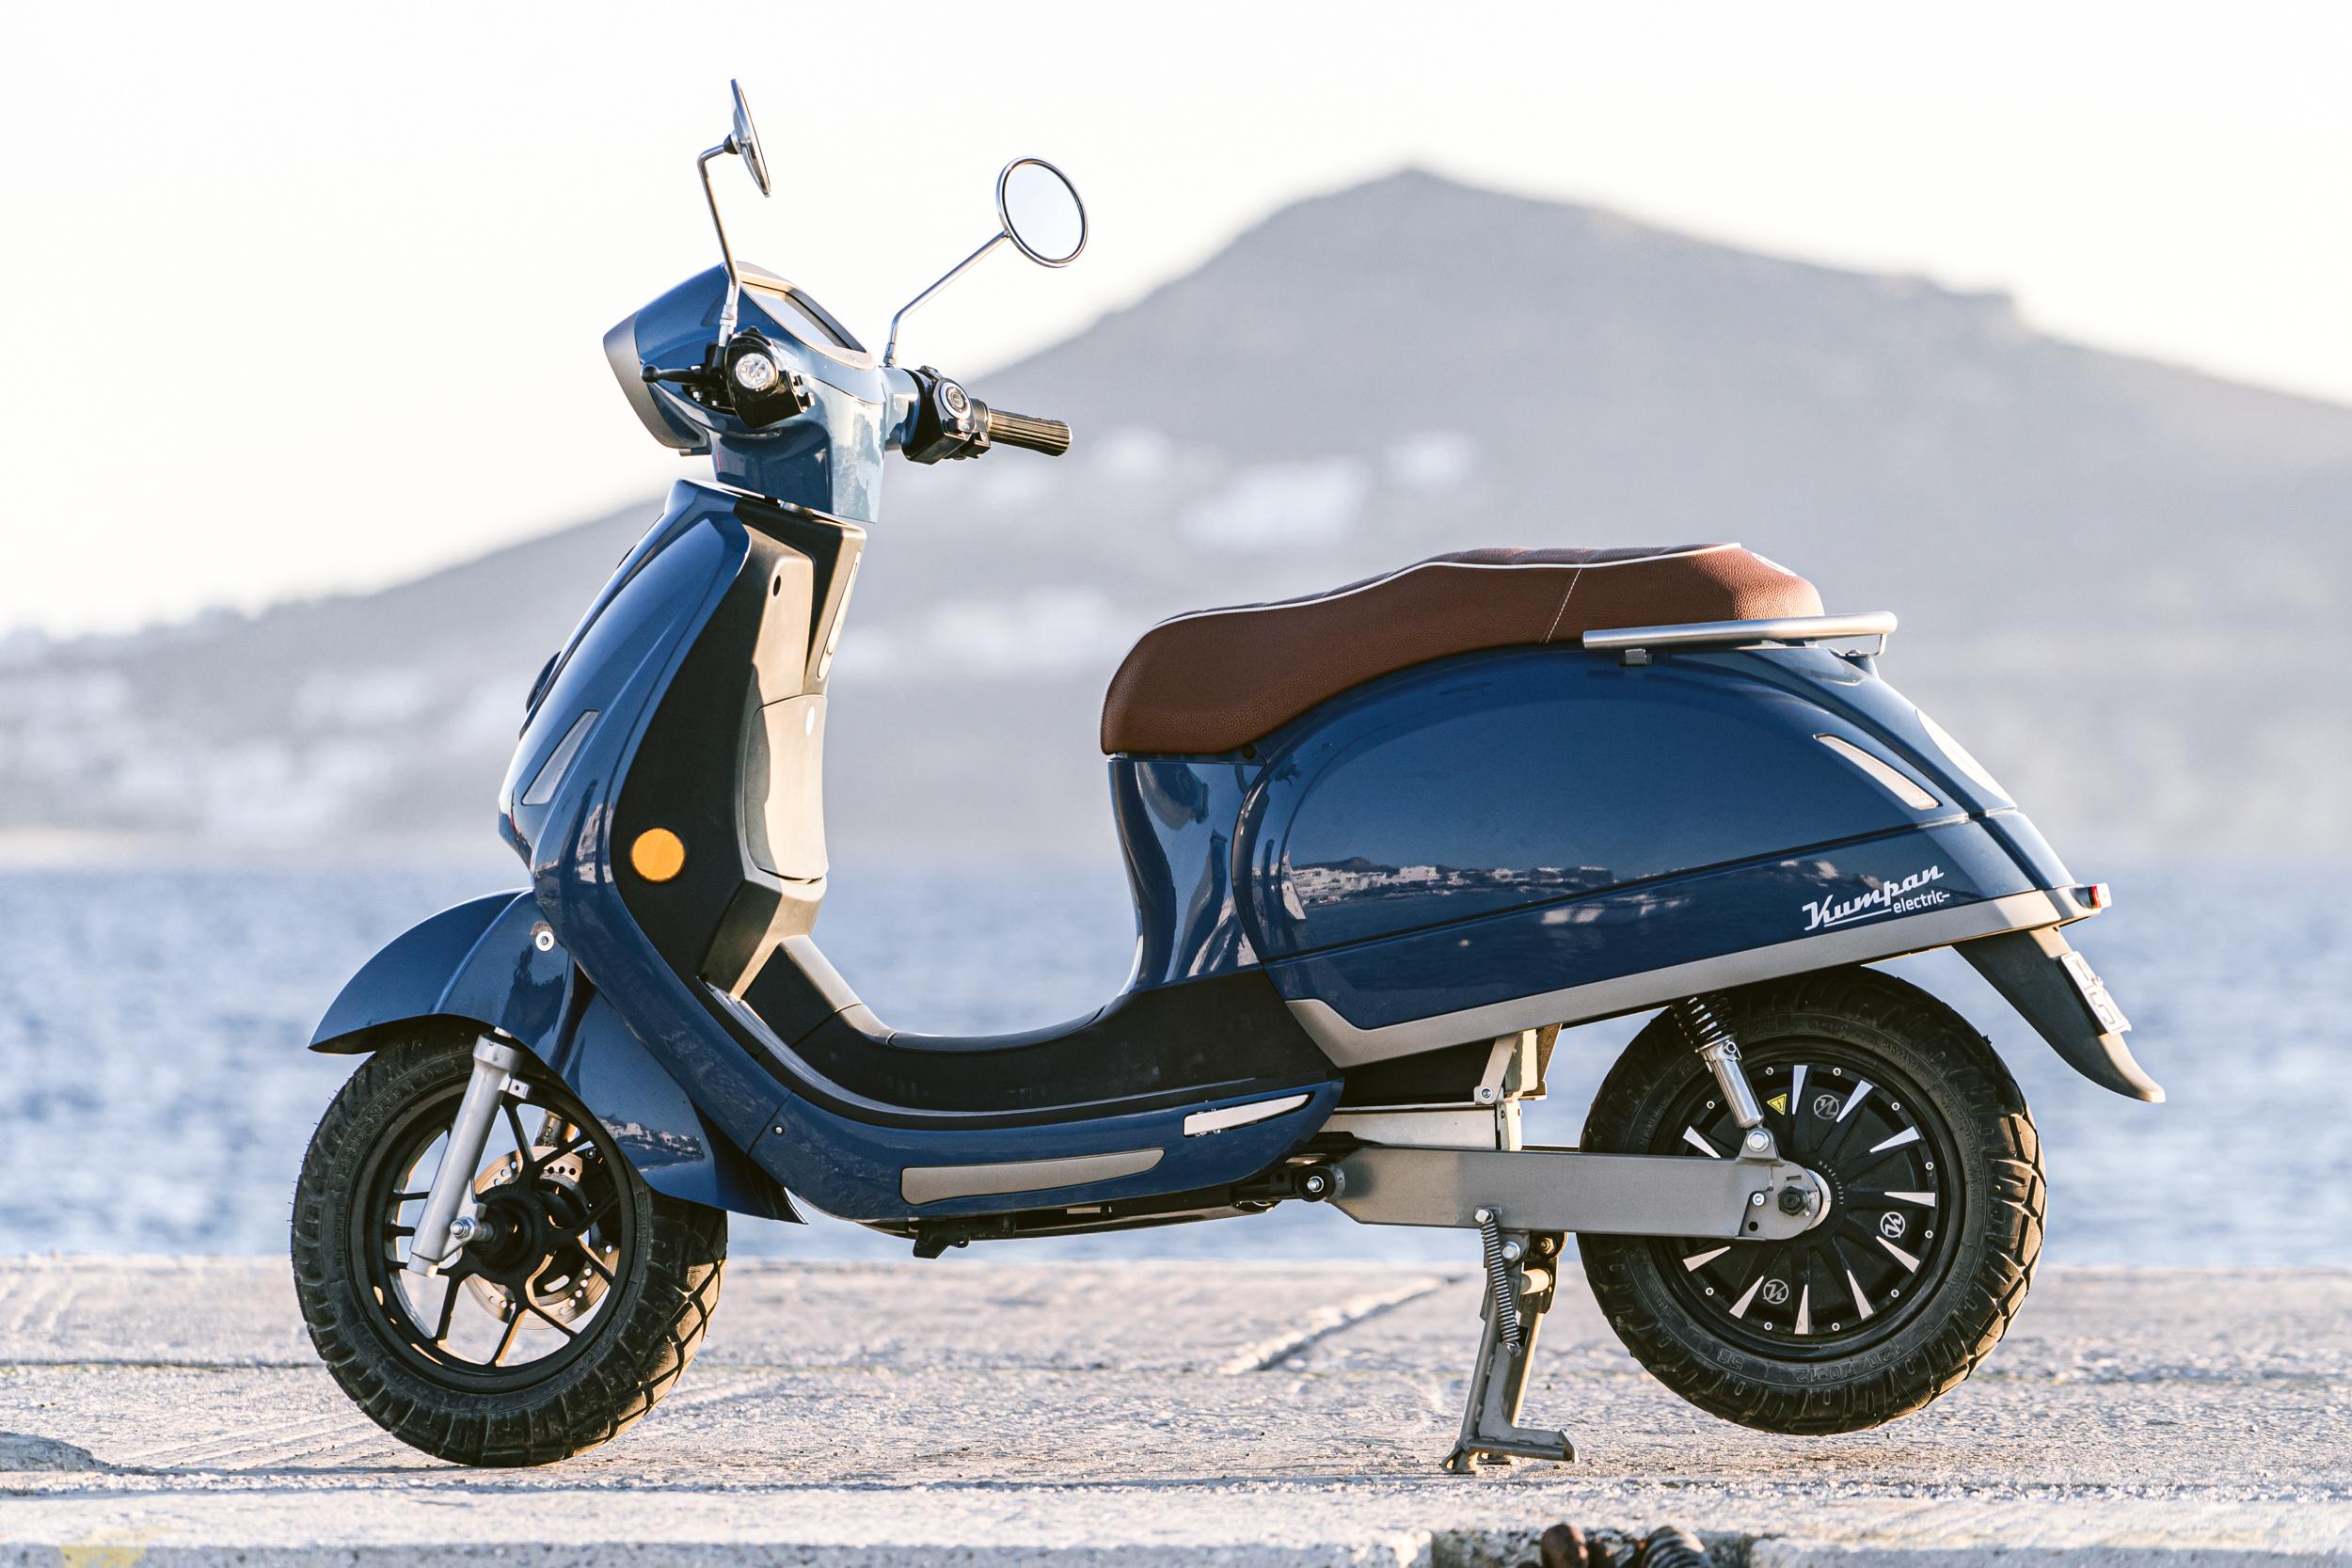 kumpan emobility scooter naxos rental greece flisvos sportclub griekenland vakantie electric zomer island hopping